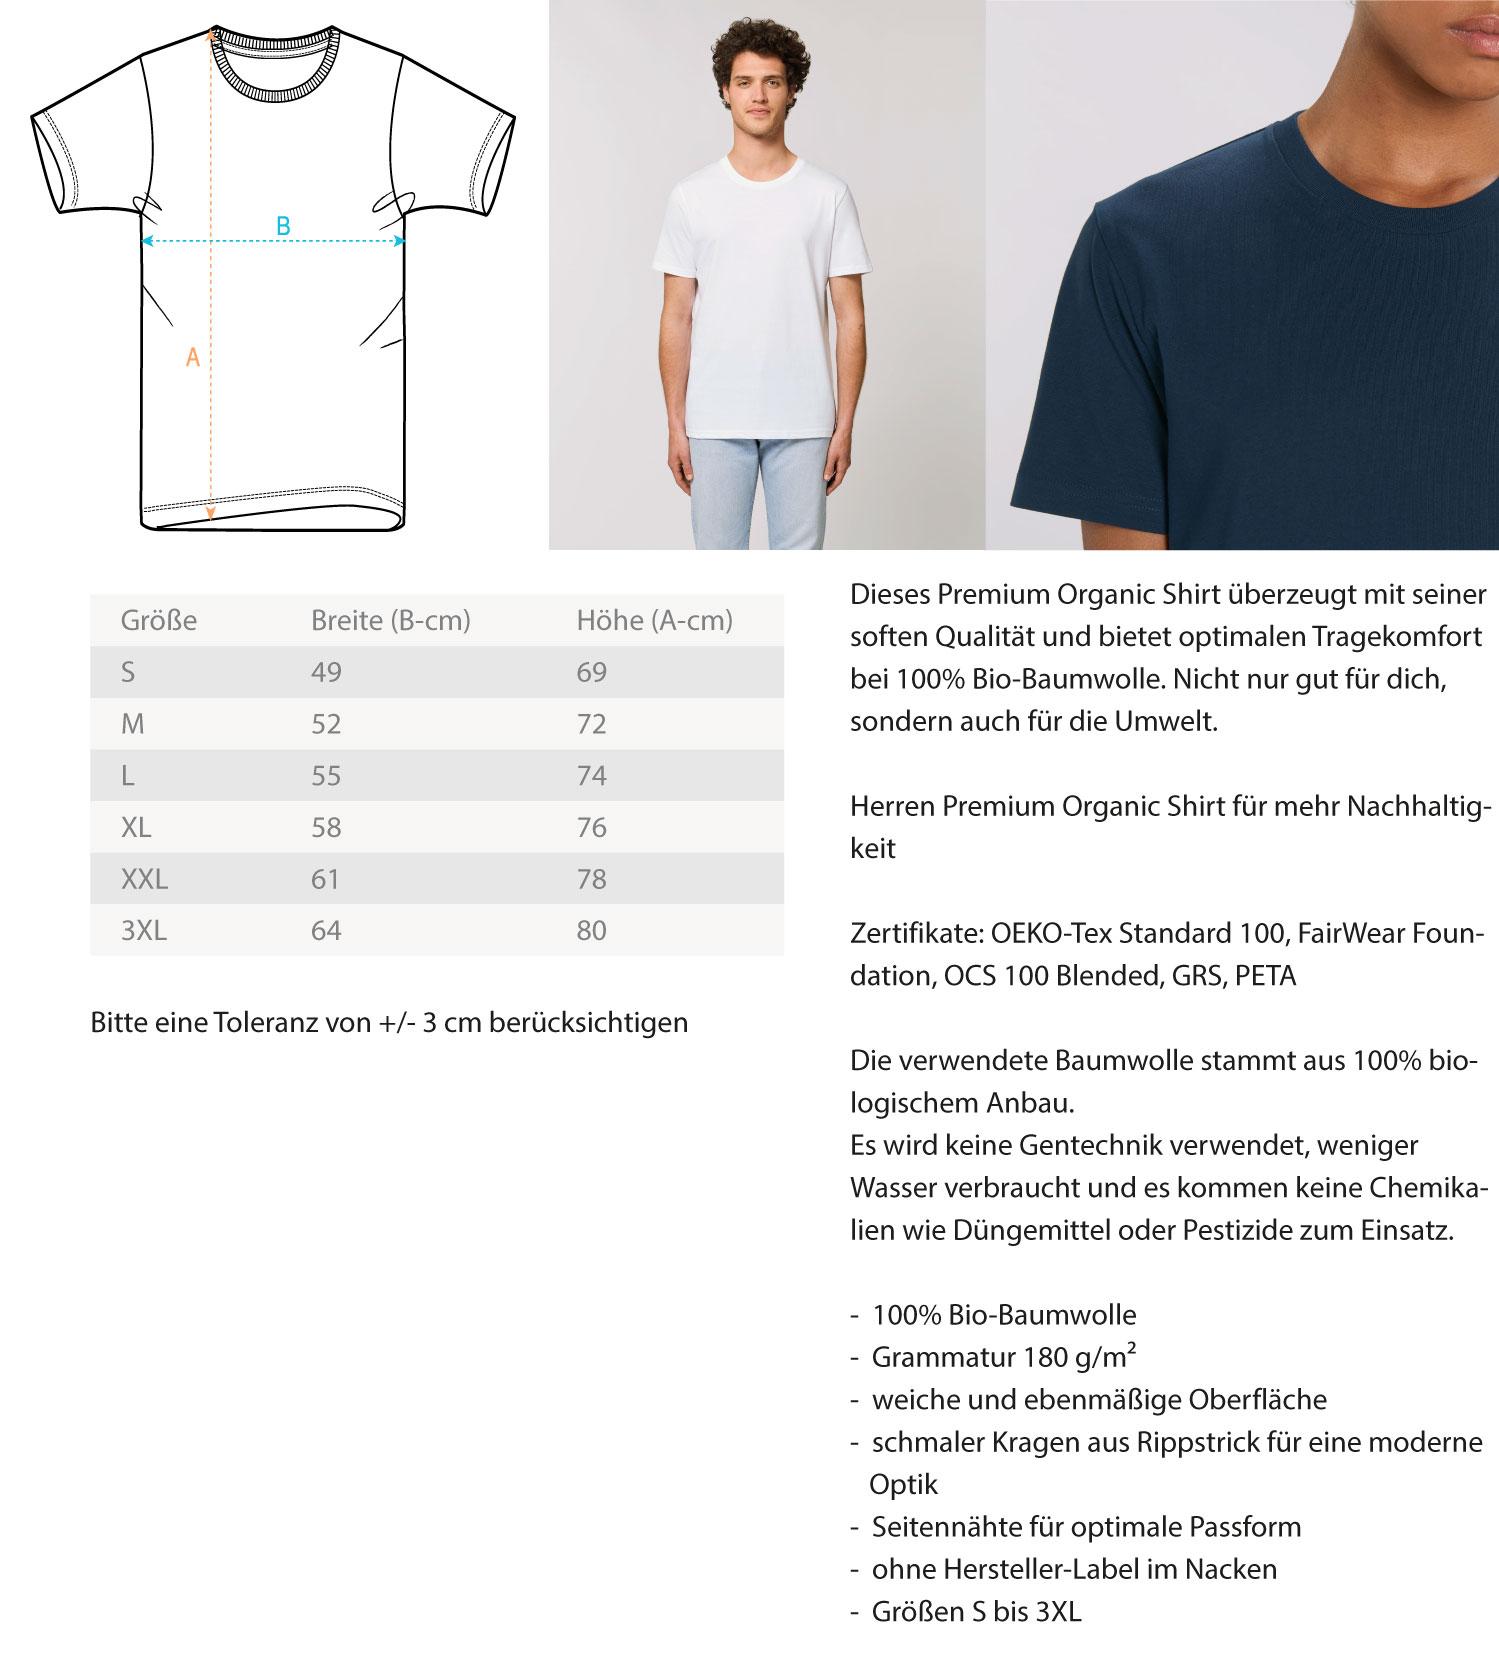 Old Town Freiburg (Unisex/Herren Premium Organic Shirt ST/ST)